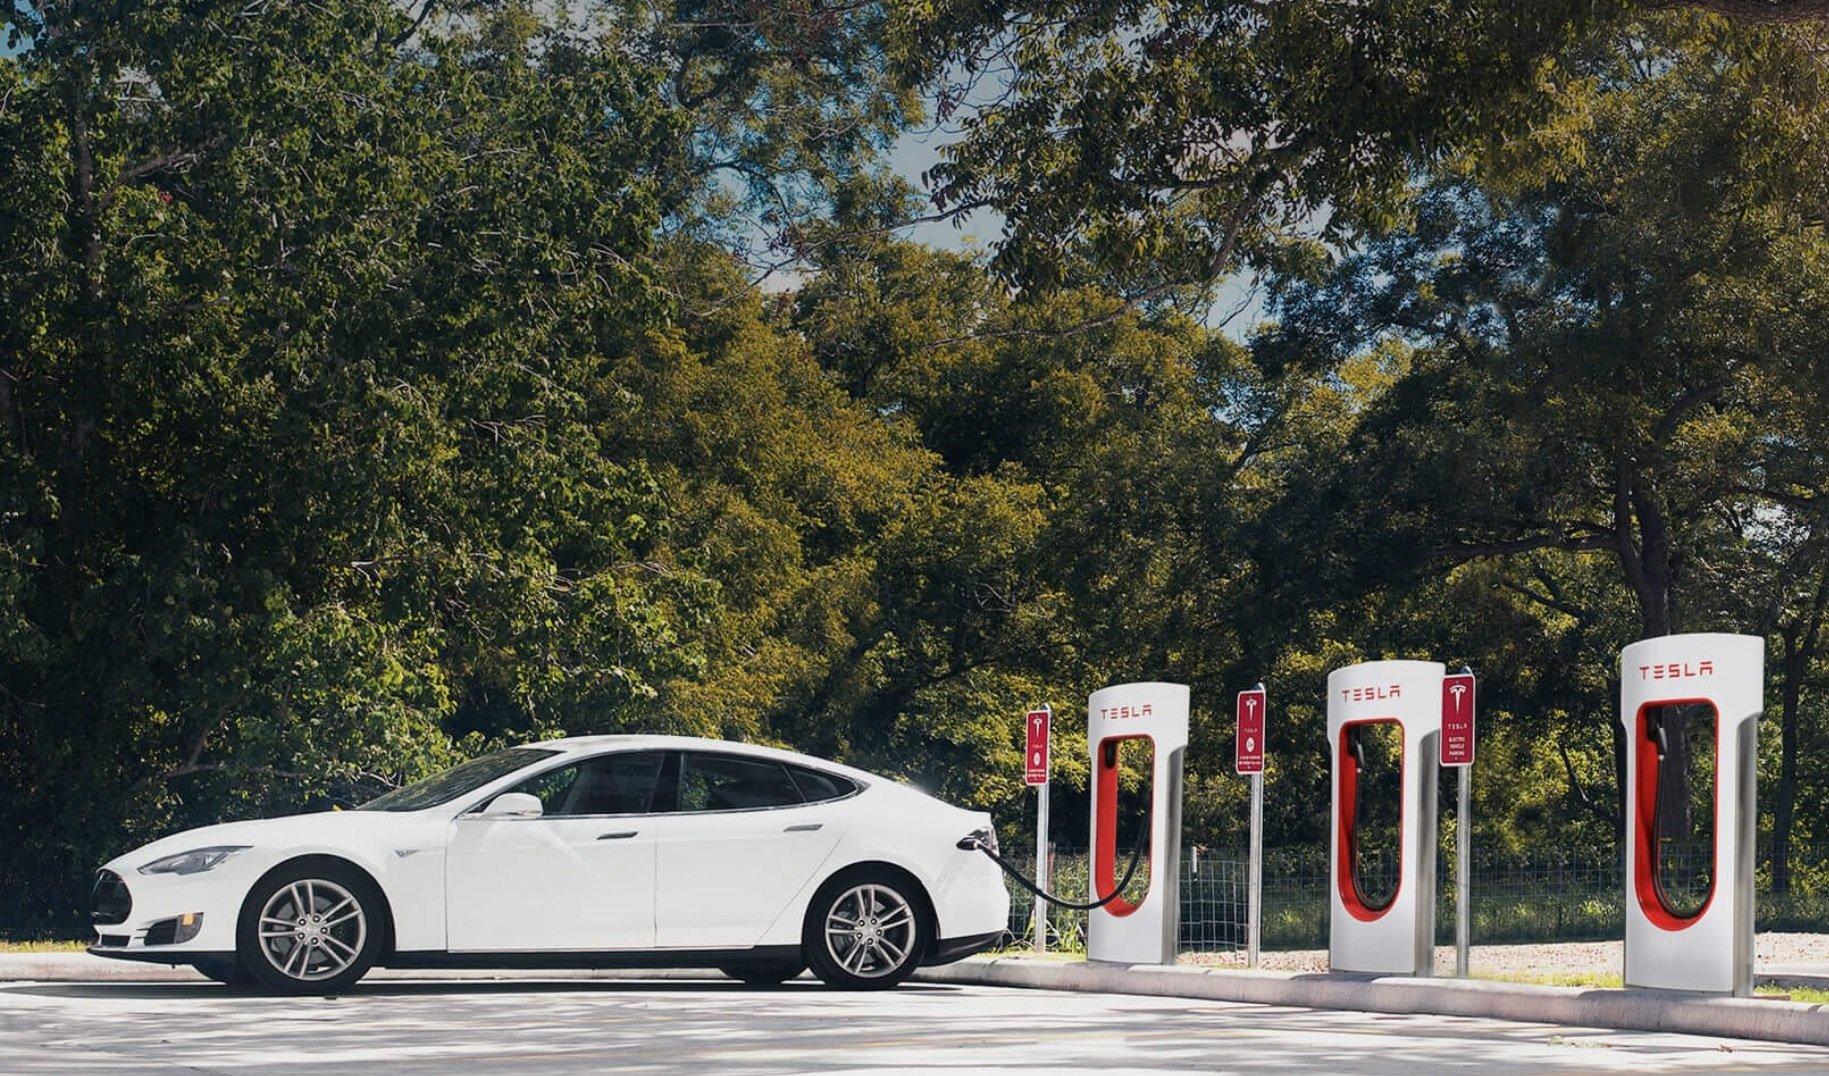 Электромобили Tesla преодолели неменее 10 млрд километров